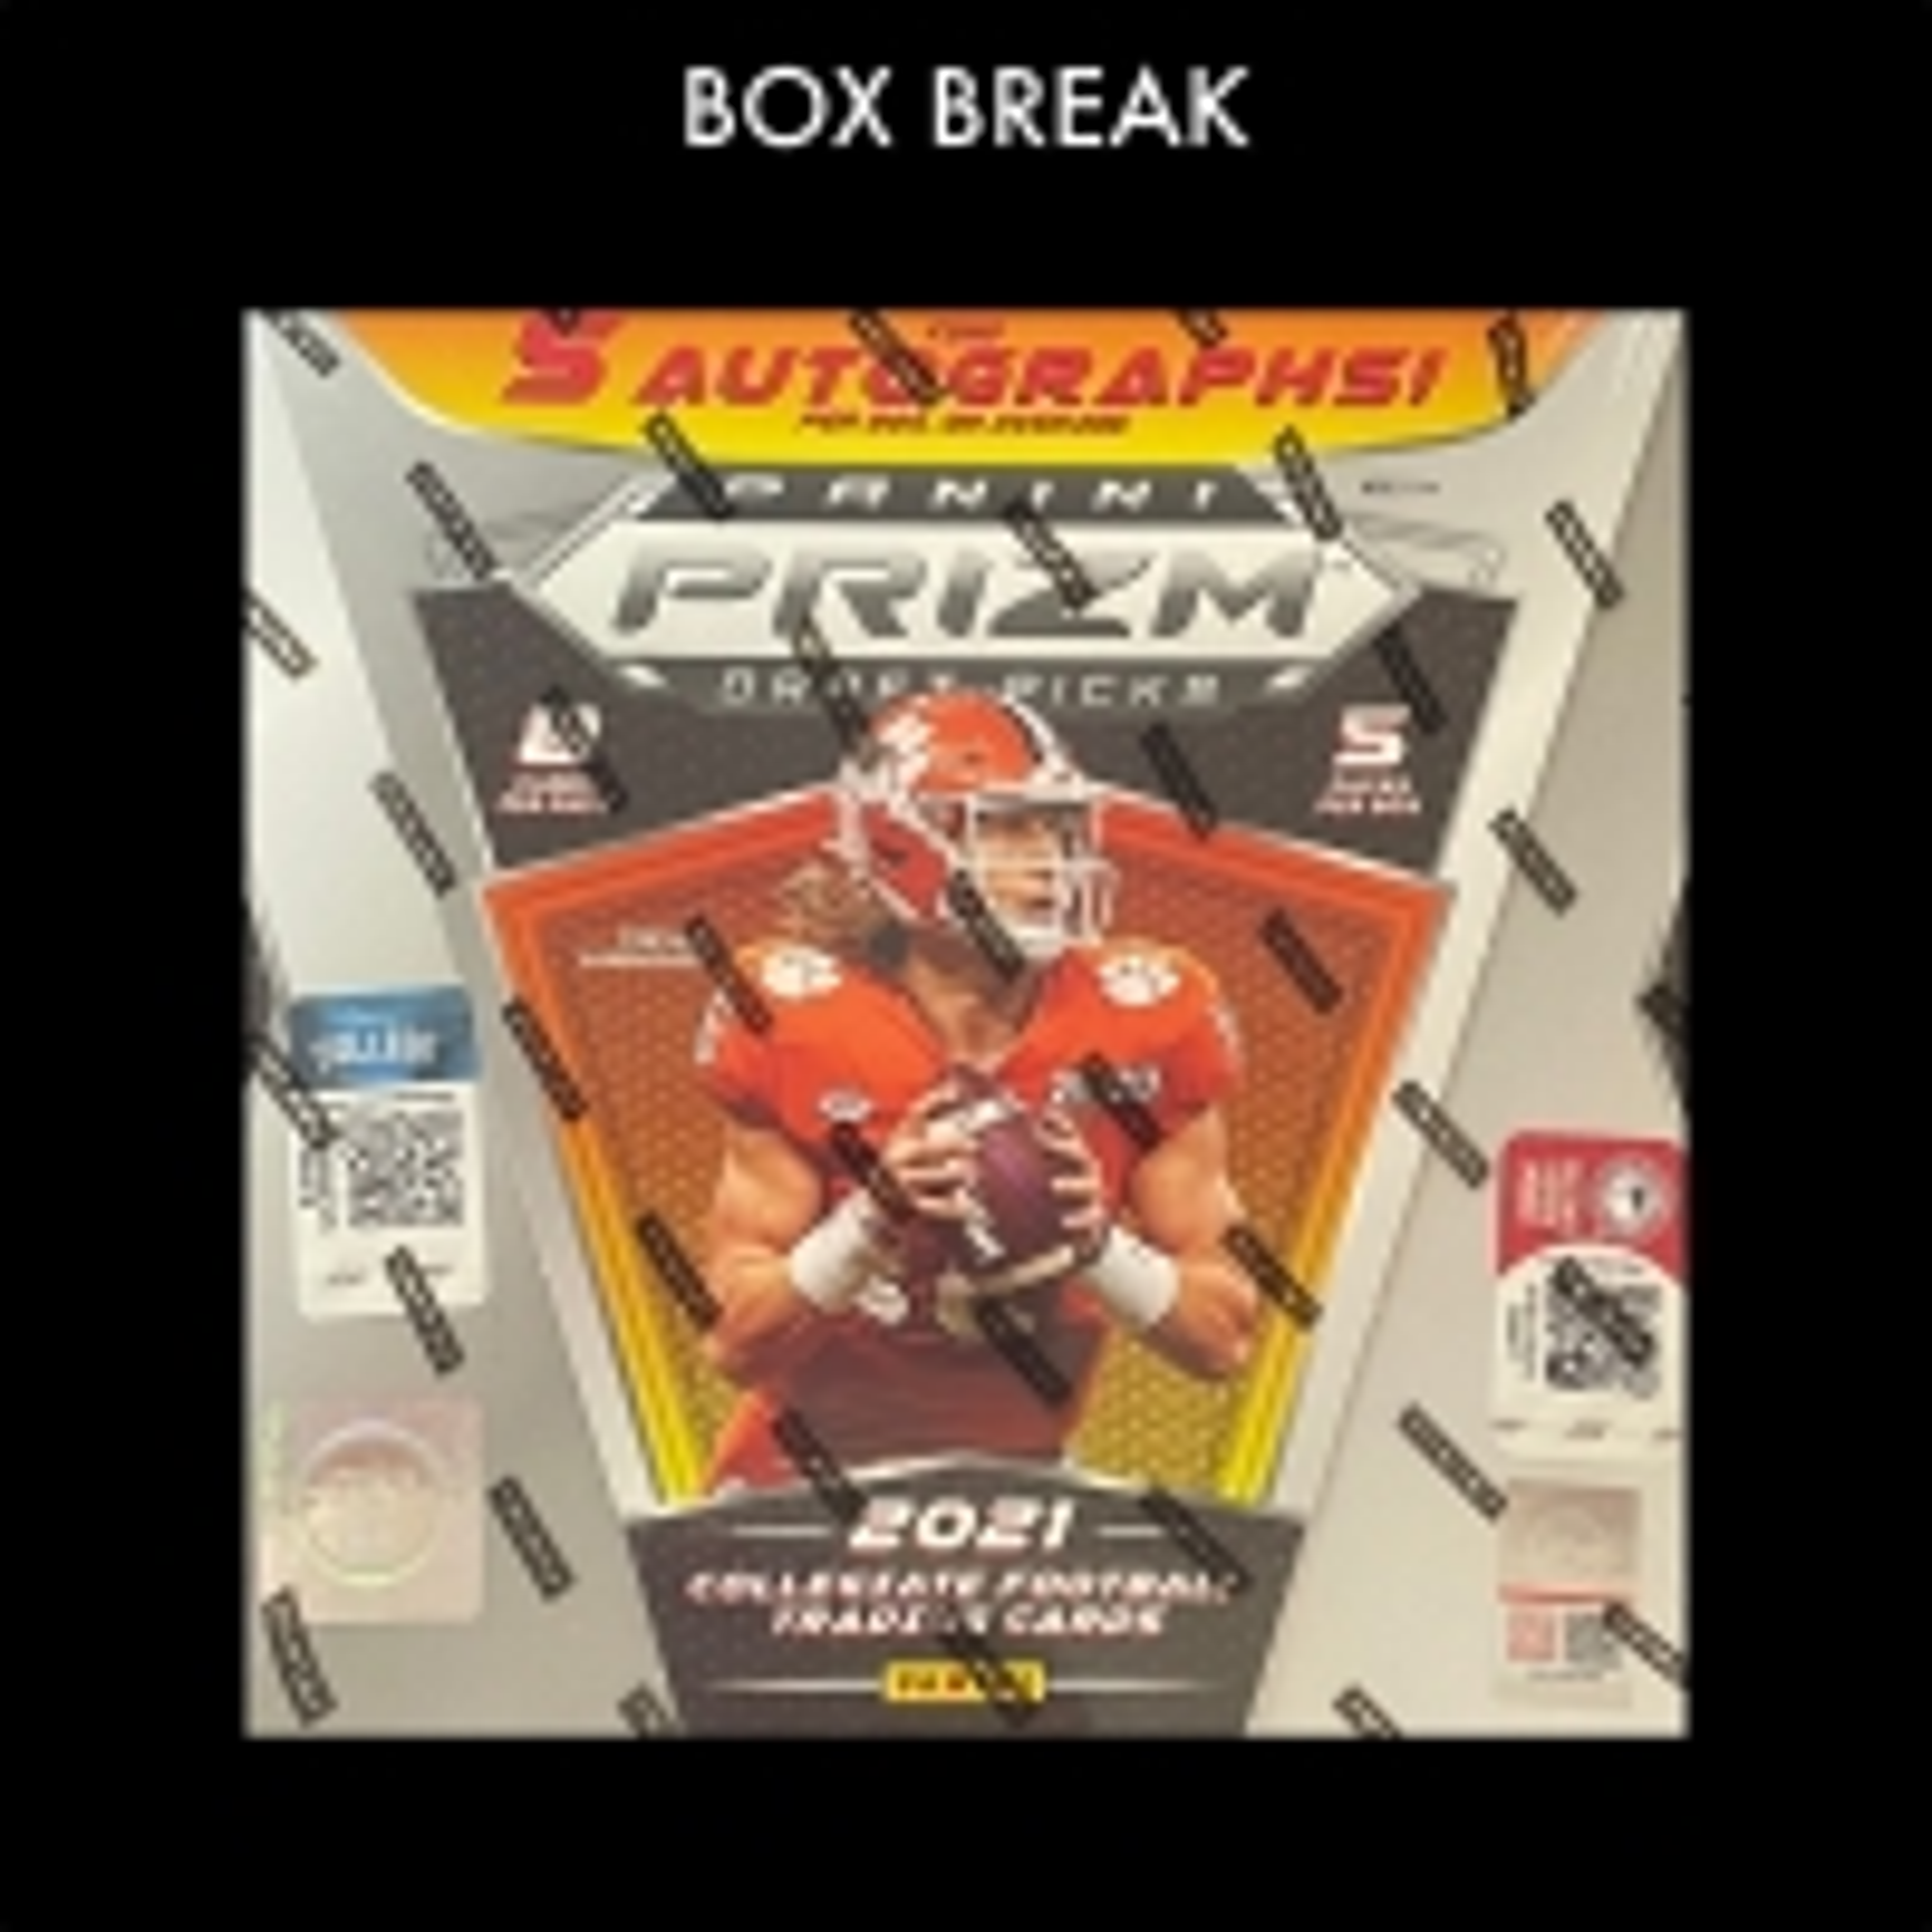 2021 PANINI PRIZM FOOTBALL DRAFT PICKS HOBBY BOX (5 PACKS AVAILABLE)